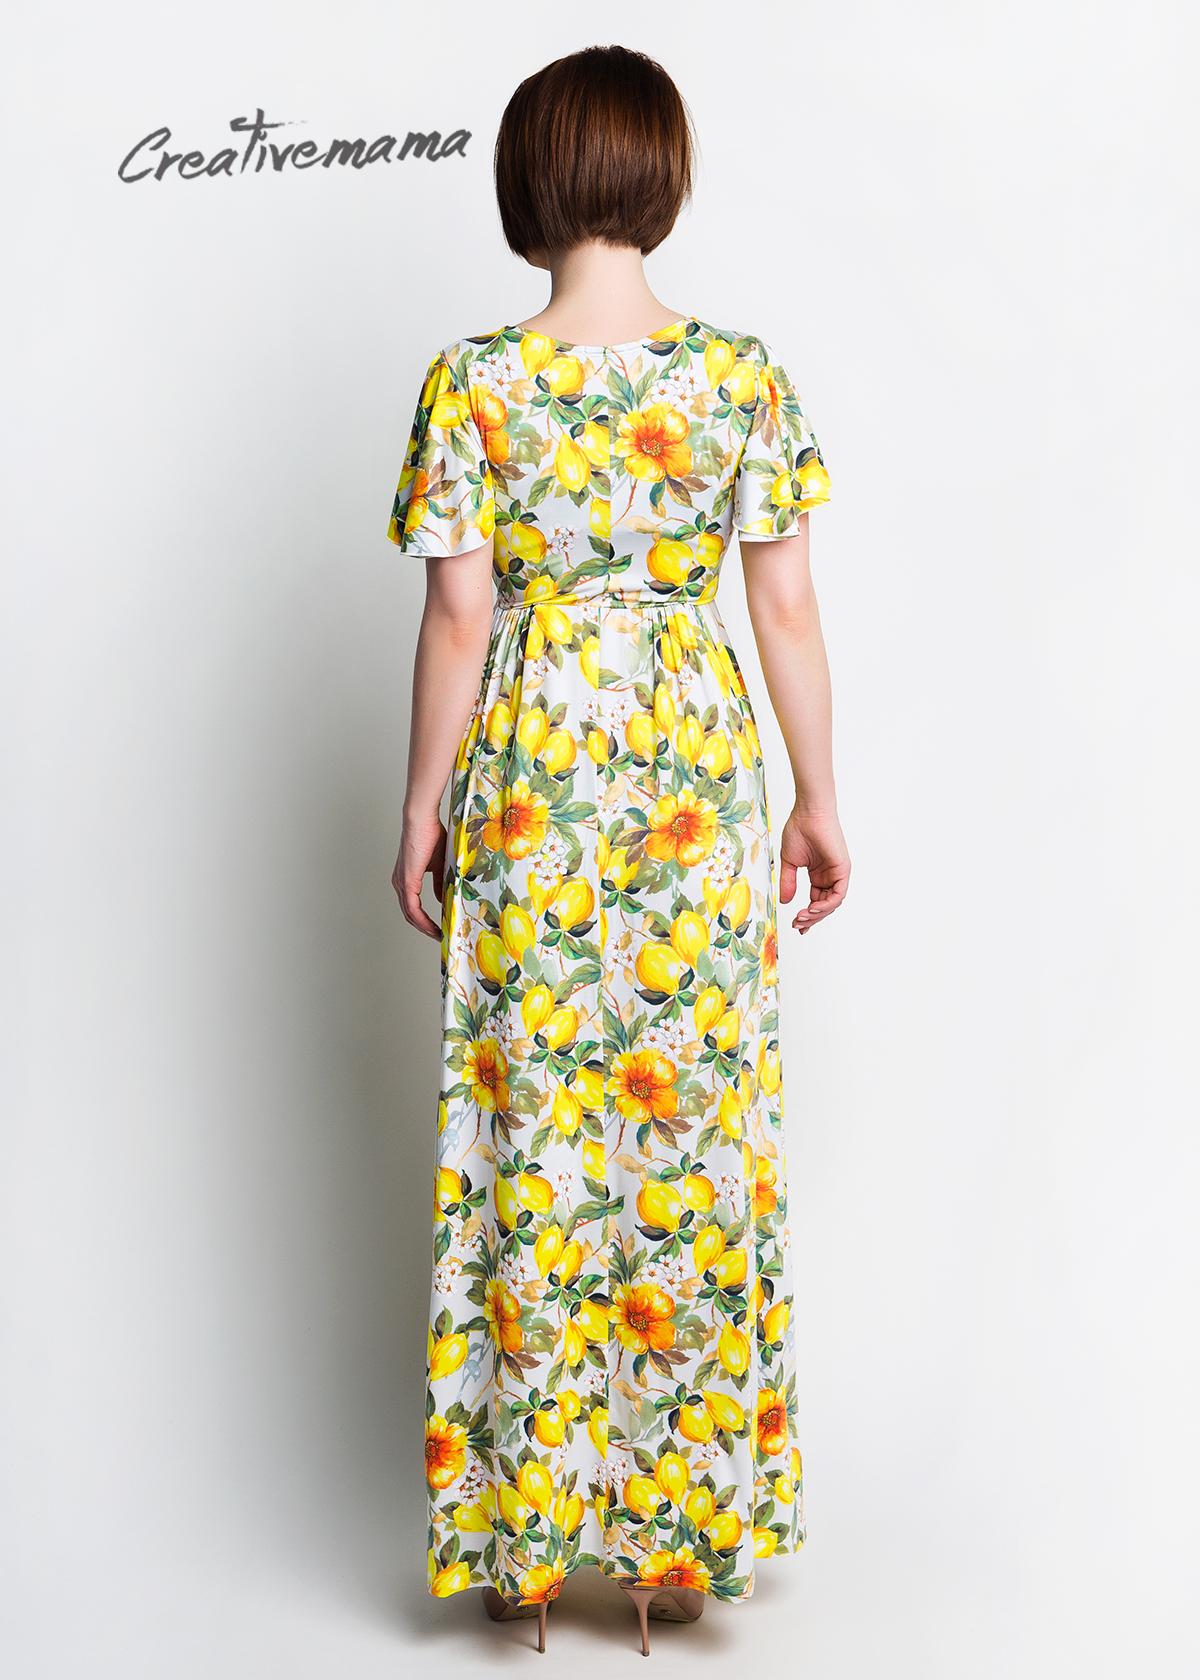 sarafan-limone-creativemama1